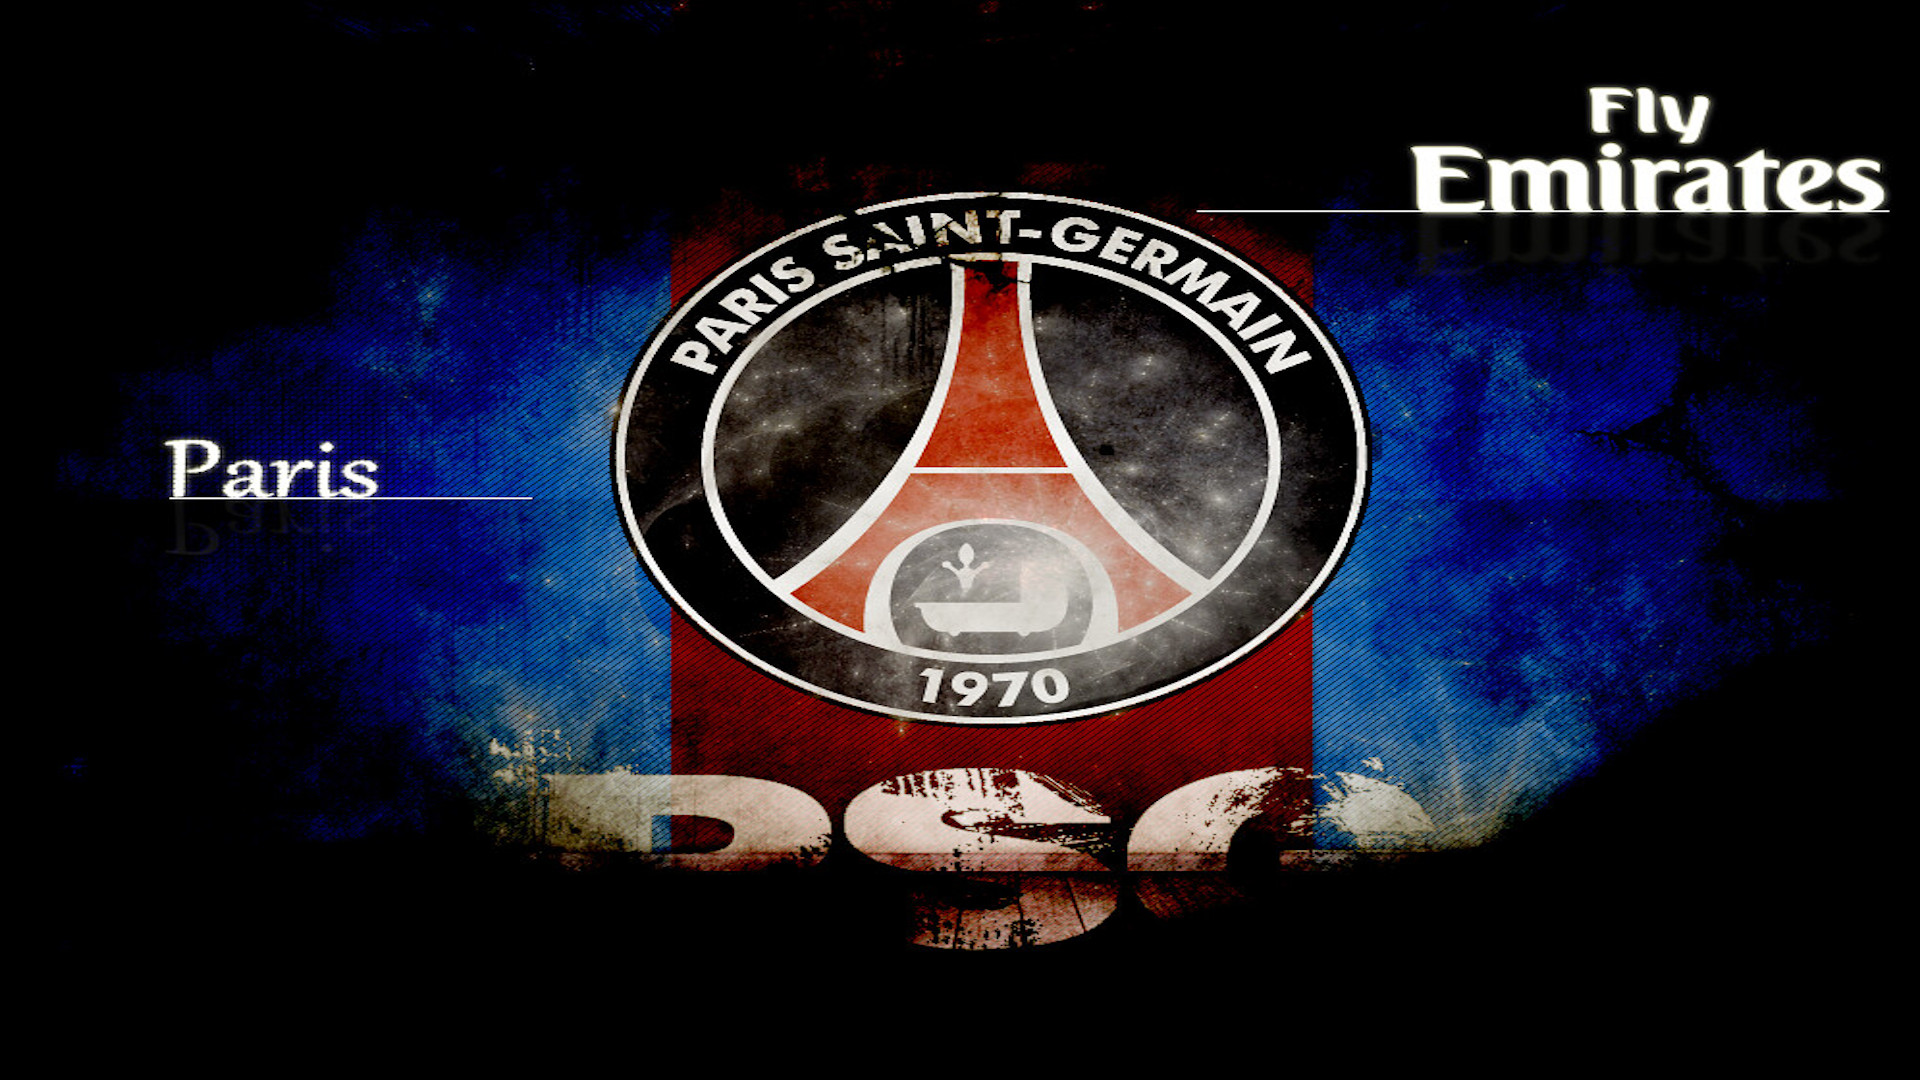 paris saint germain history and club